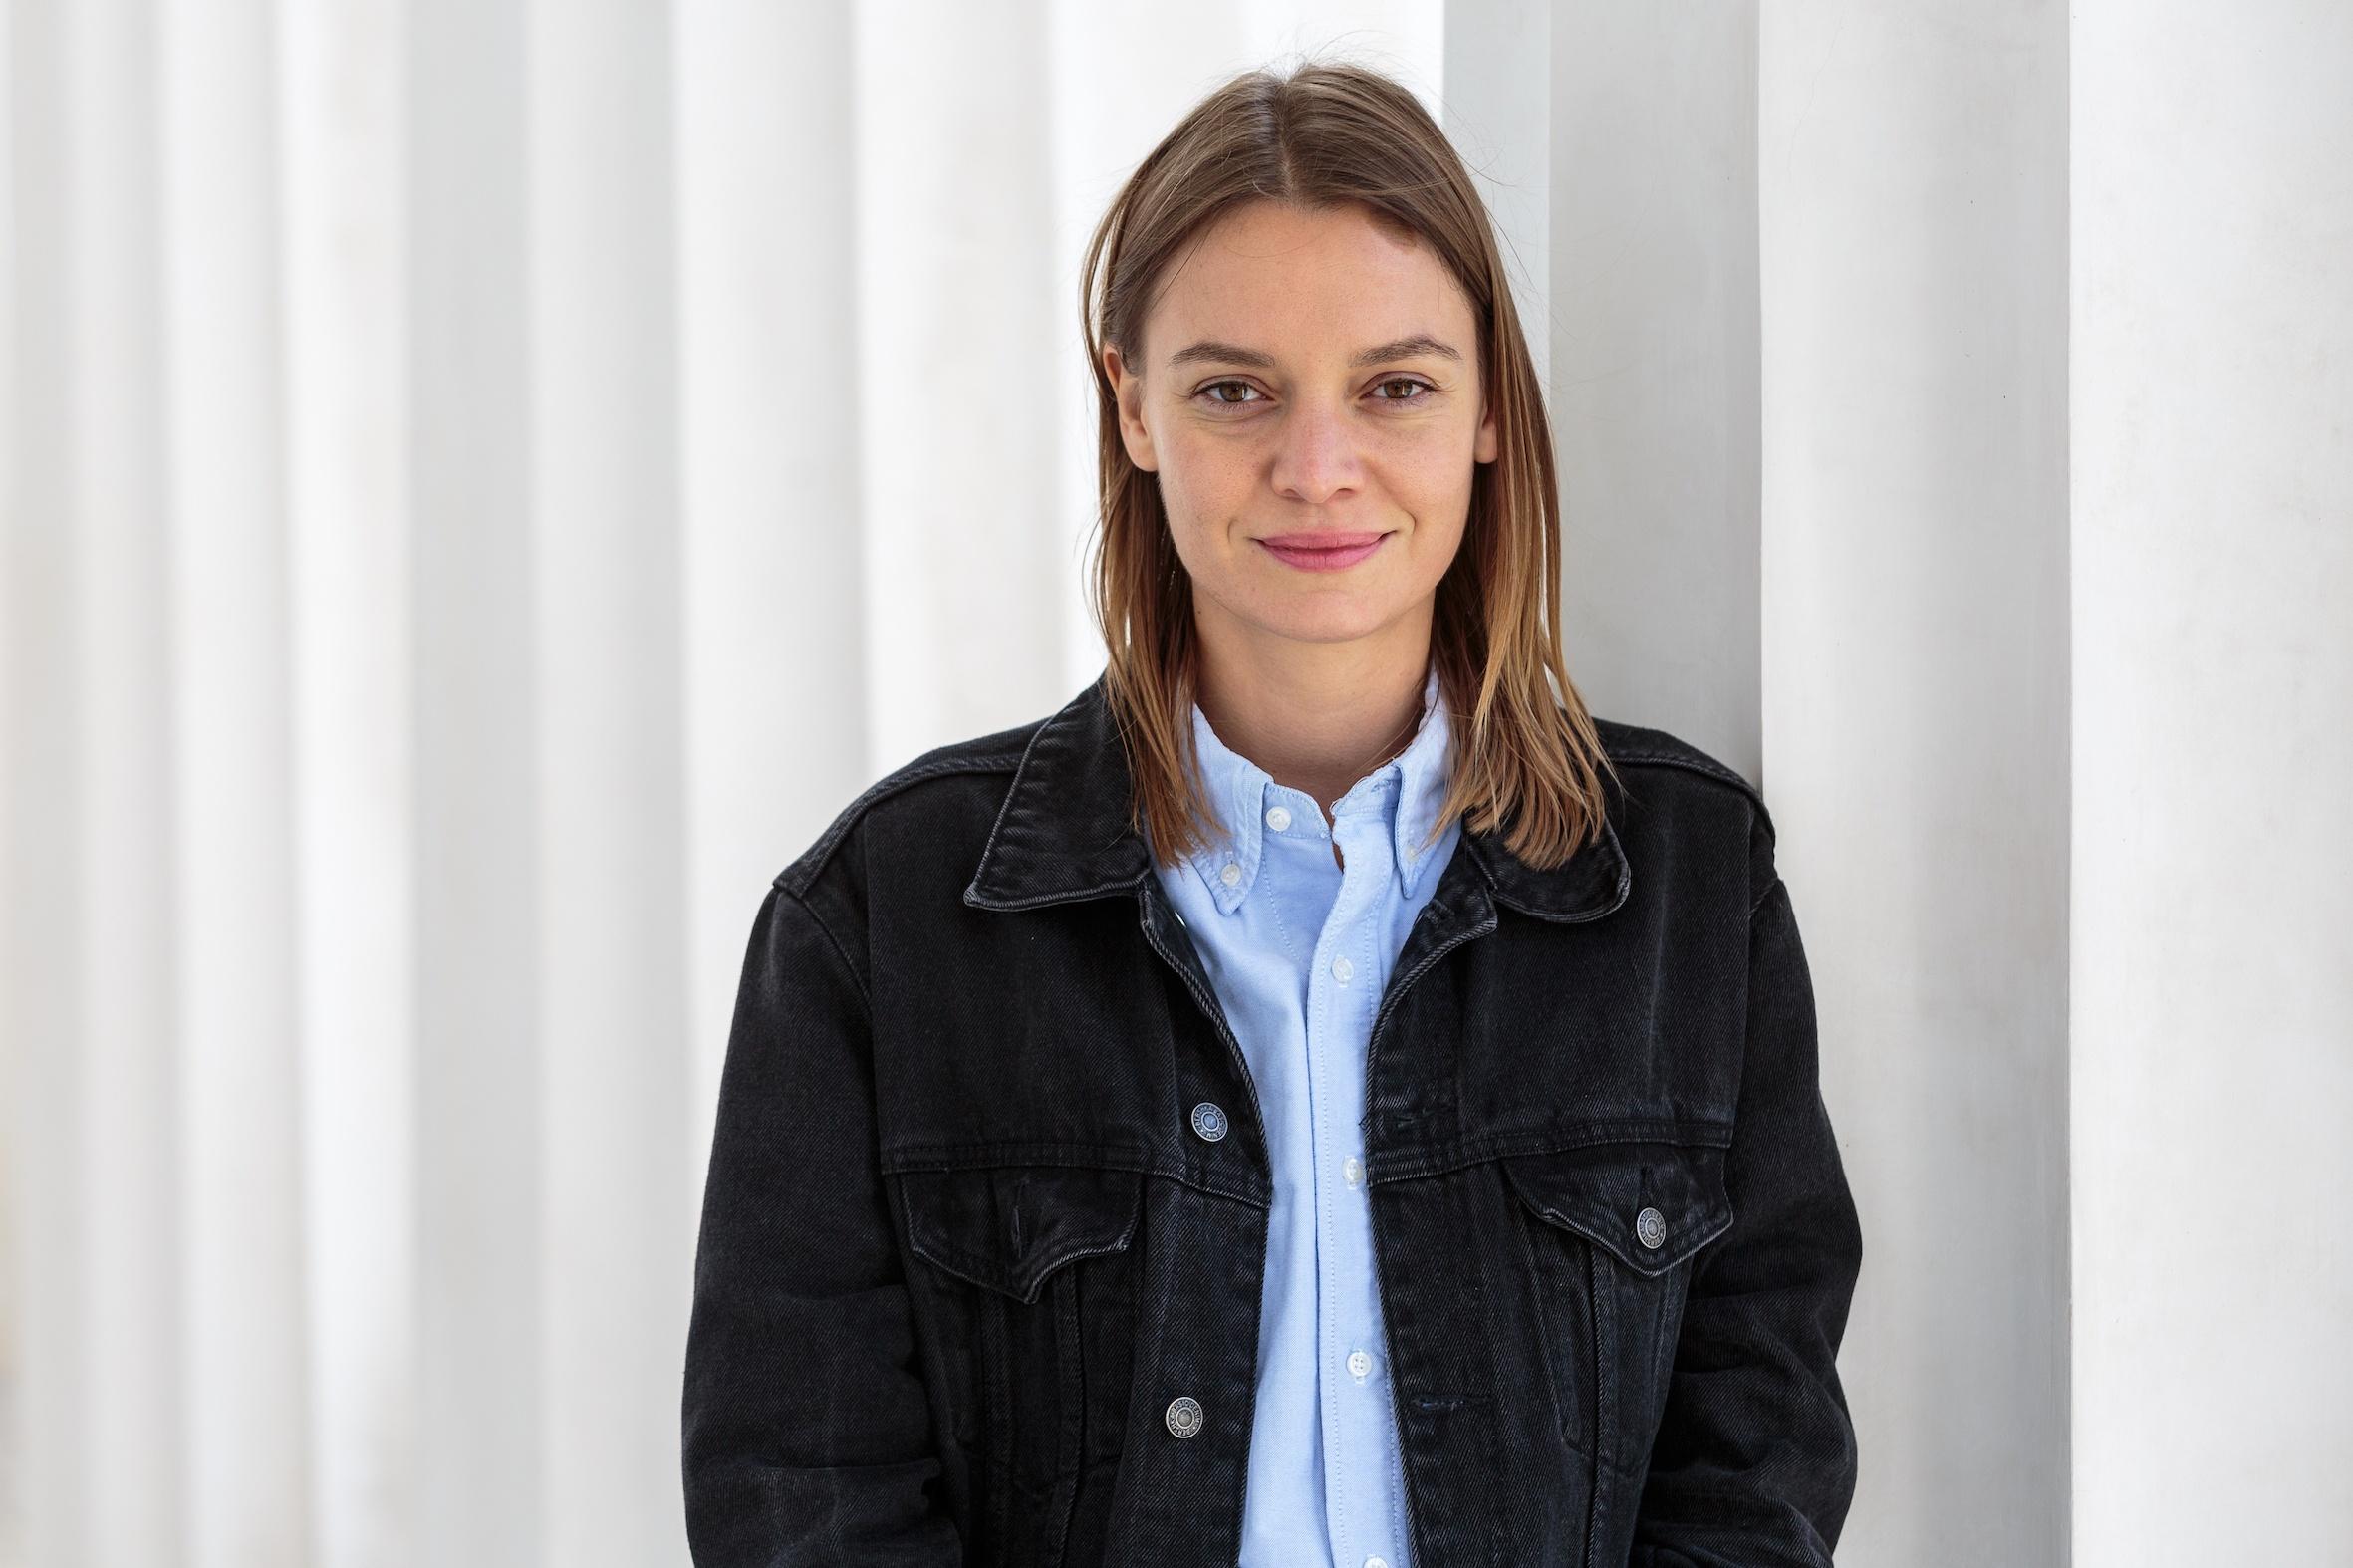 Kirsten Pöltl